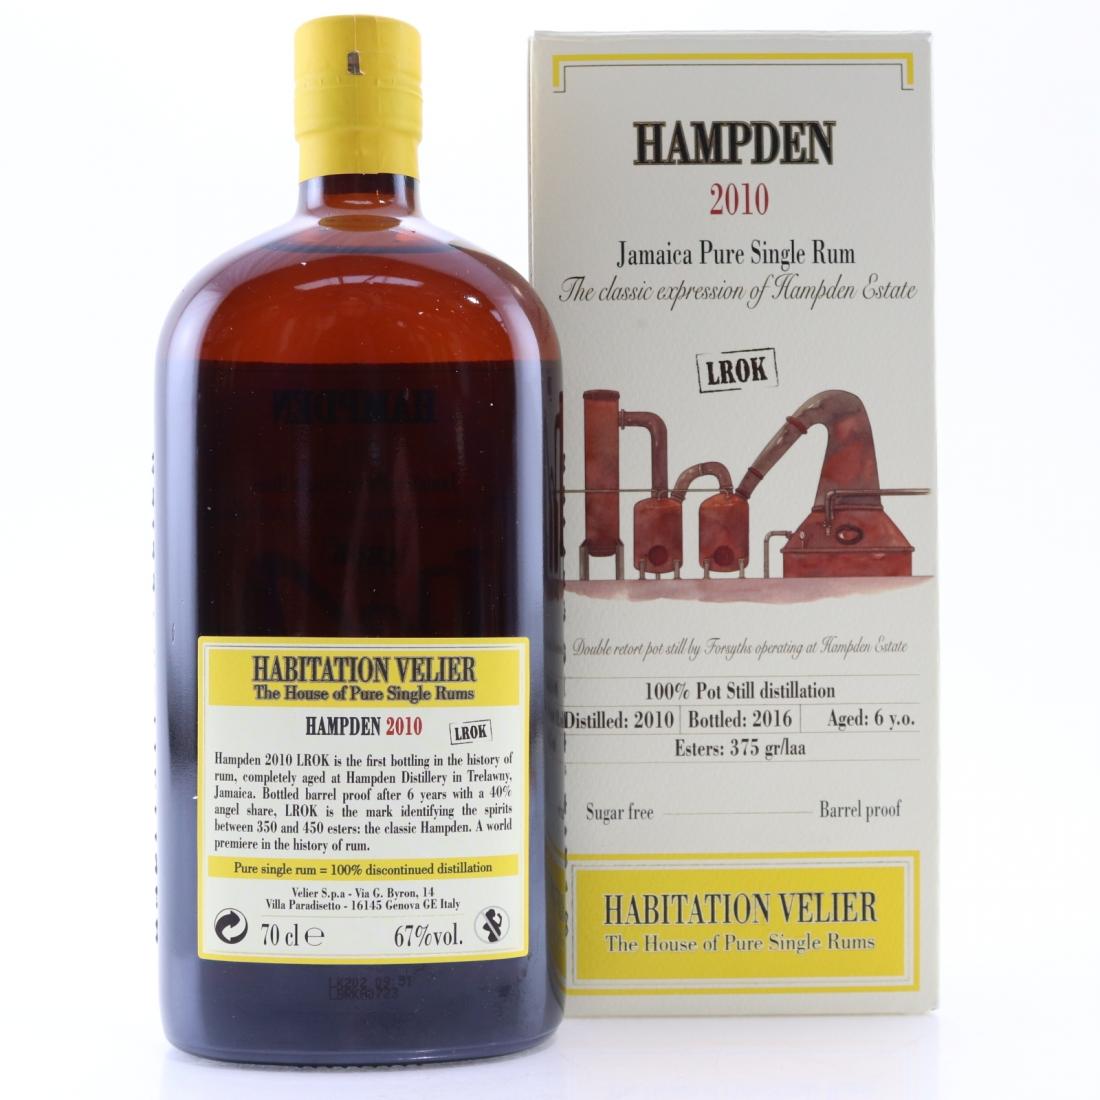 Hampden 2010 Habitation Velier 6 Year Old Jamaican Rum / LROK